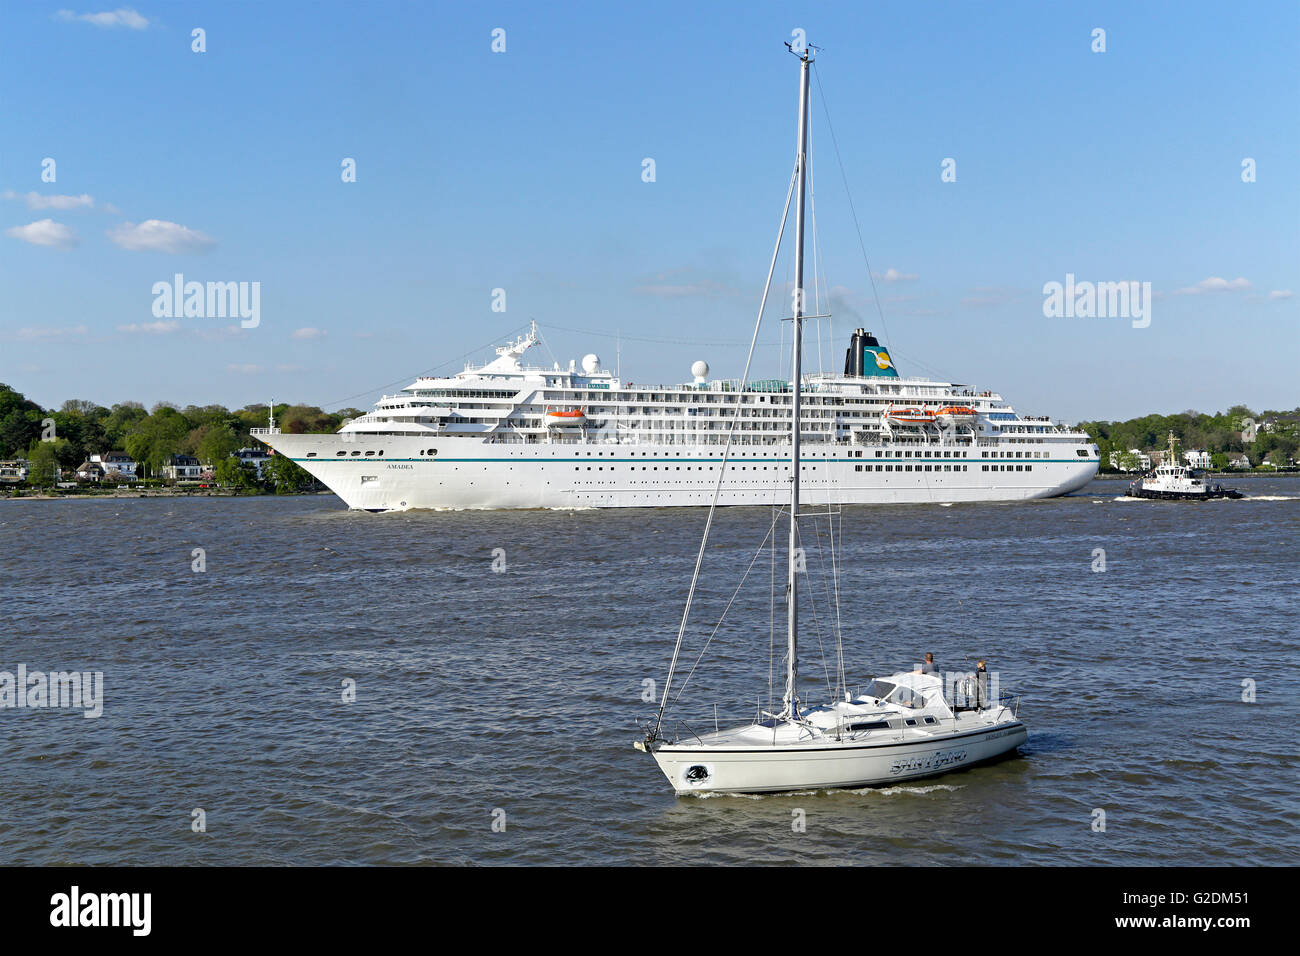 Cruise Ship Amadea Harbour Birthday Hamburg Germany Stock - Cruise ship amadea